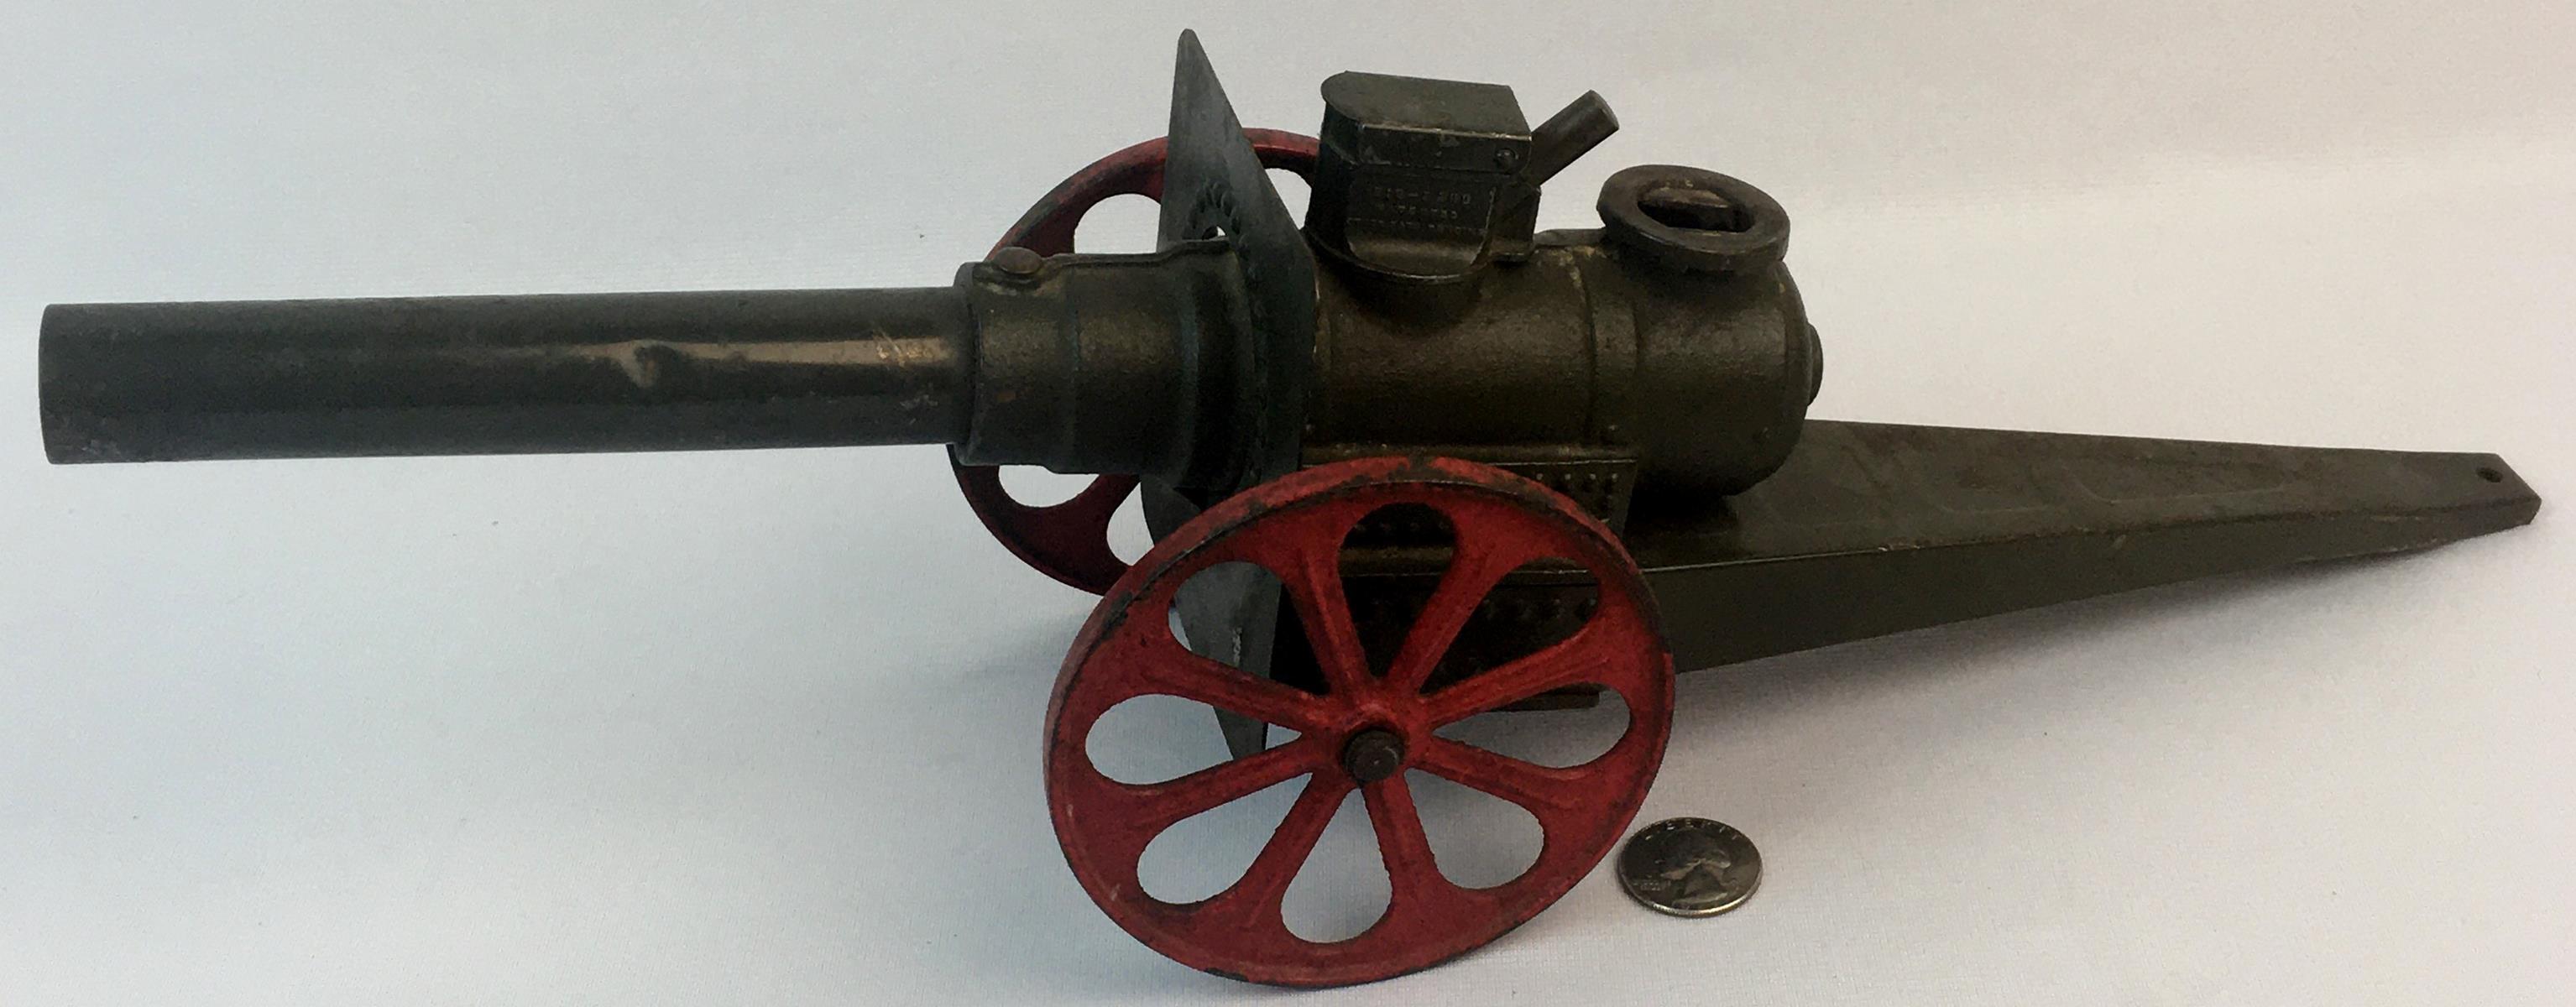 "Vintage 1950's Conestoga ""Big Bang"" No. 10 CC Metal Army Green Toy Cannon WORKS"